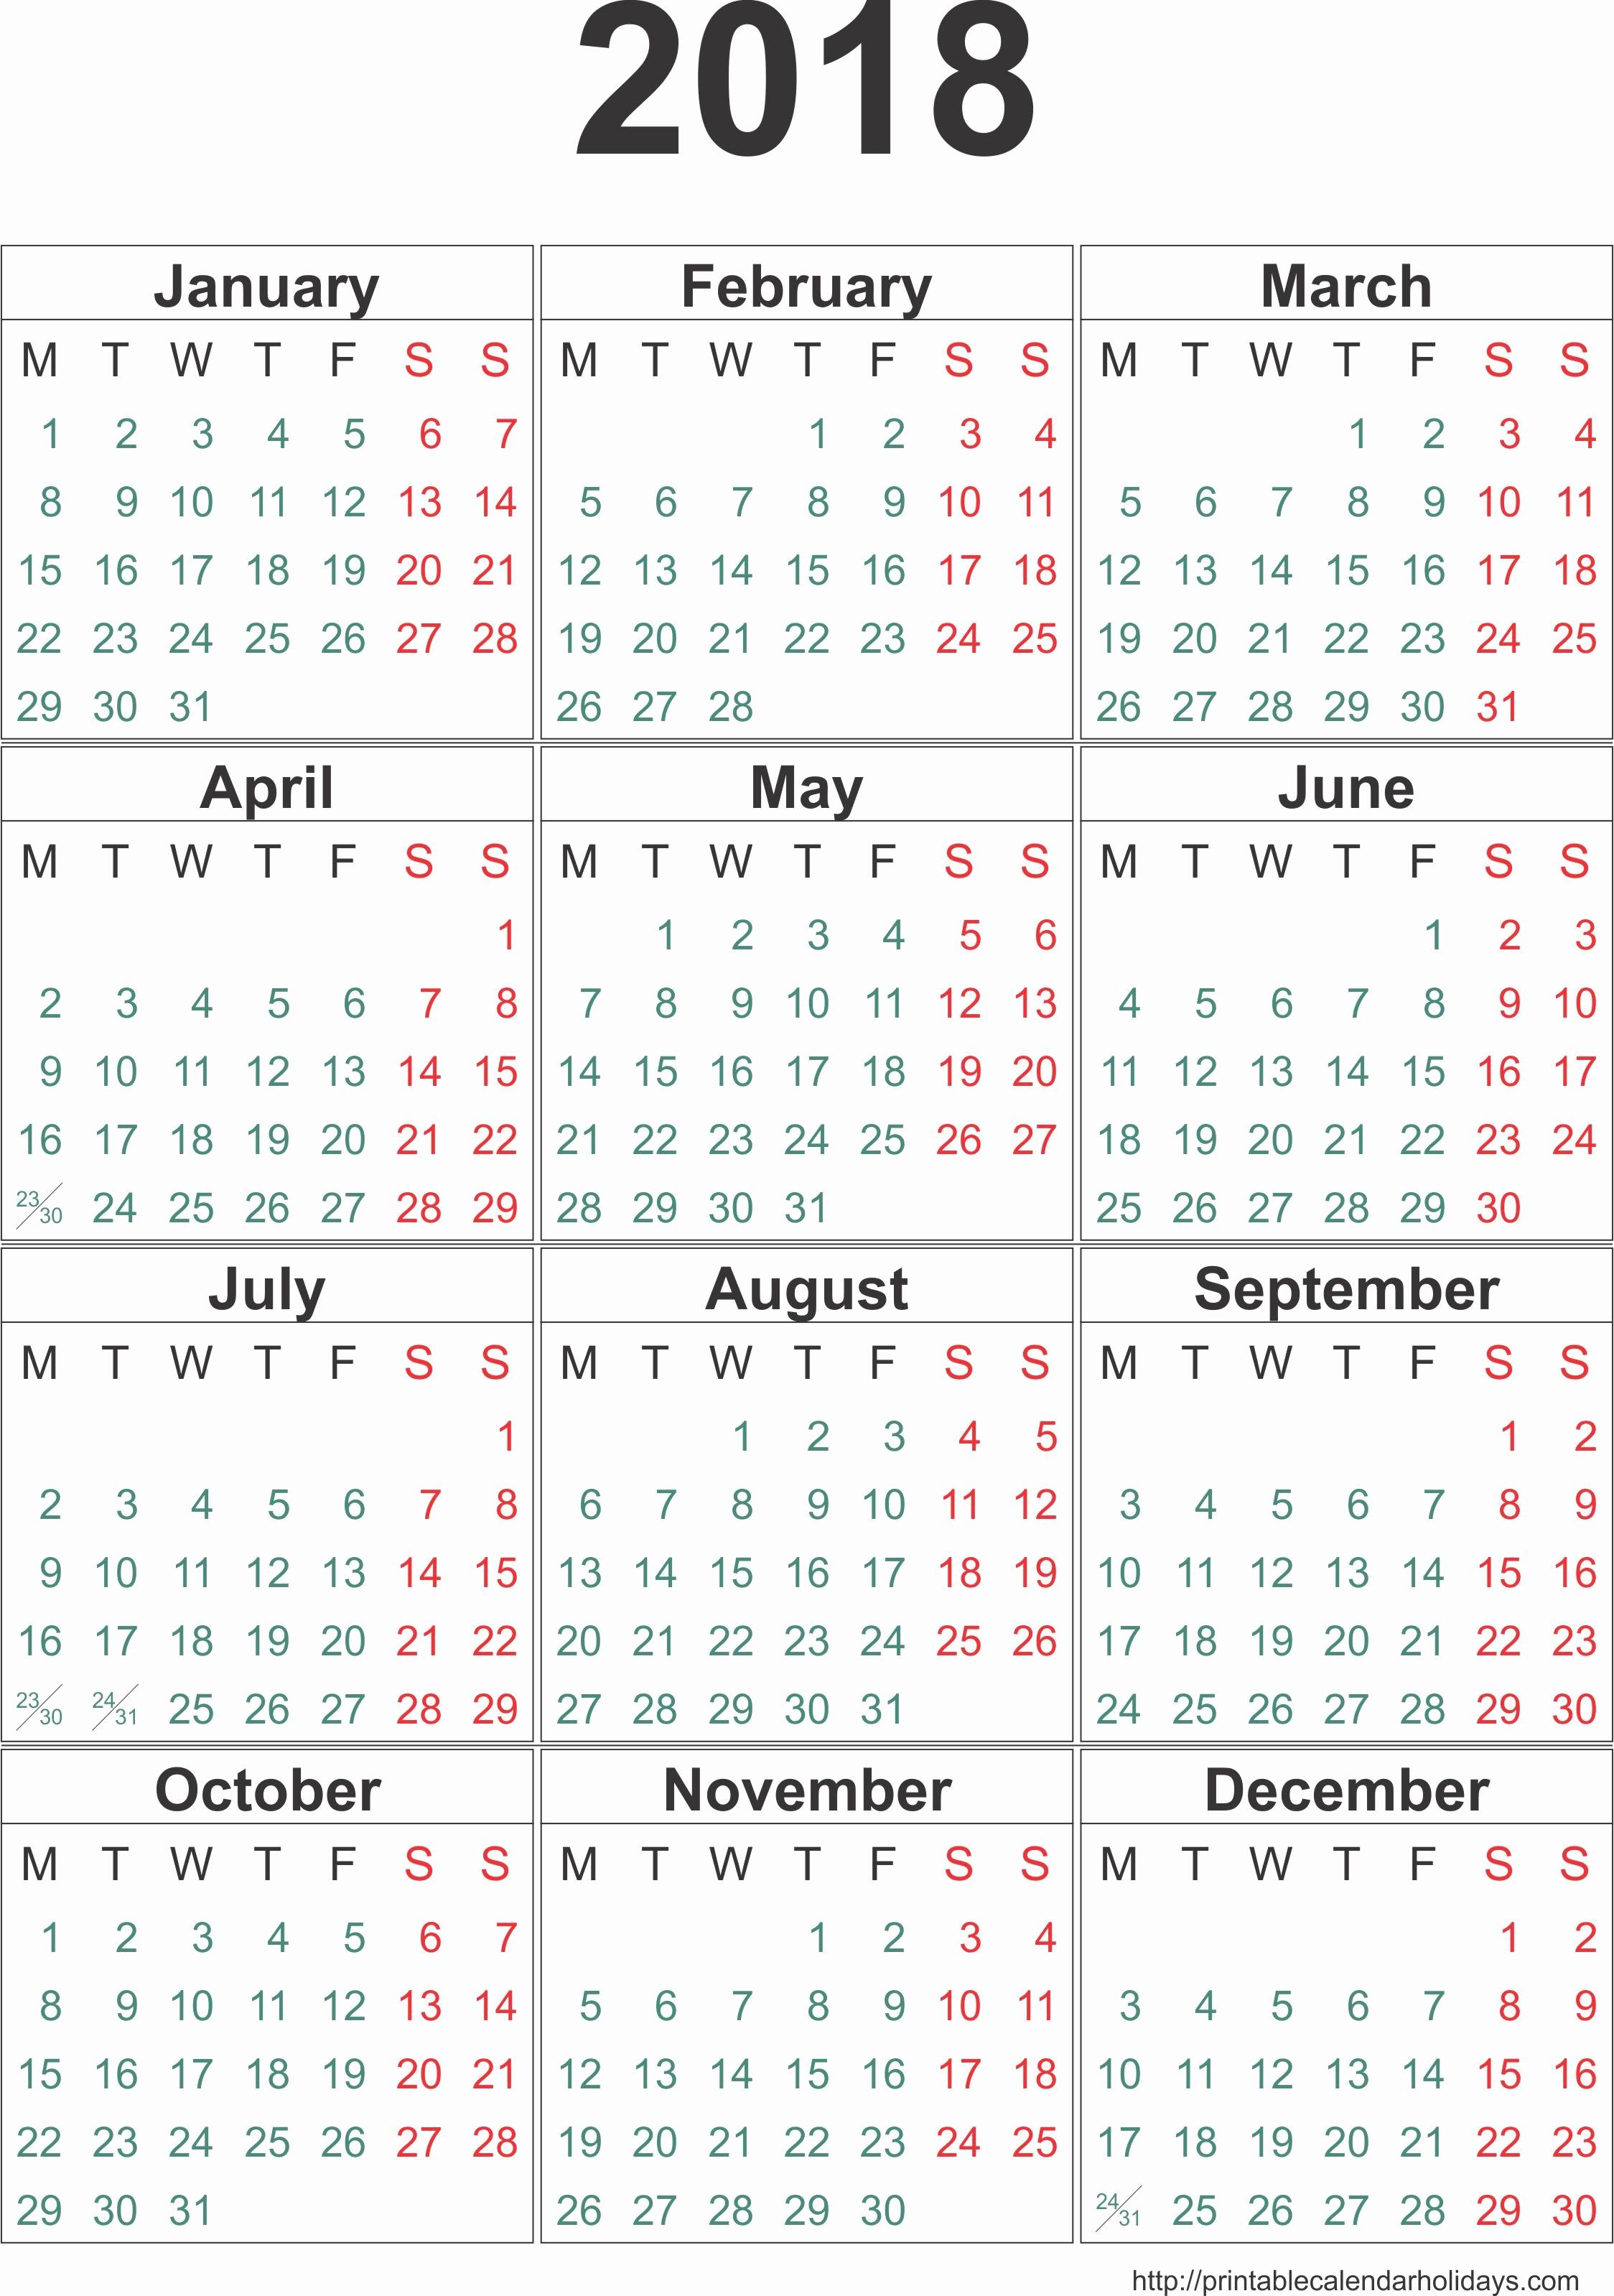 Week by Week Calendar Template Awesome 2018 Monthly Calendar Template